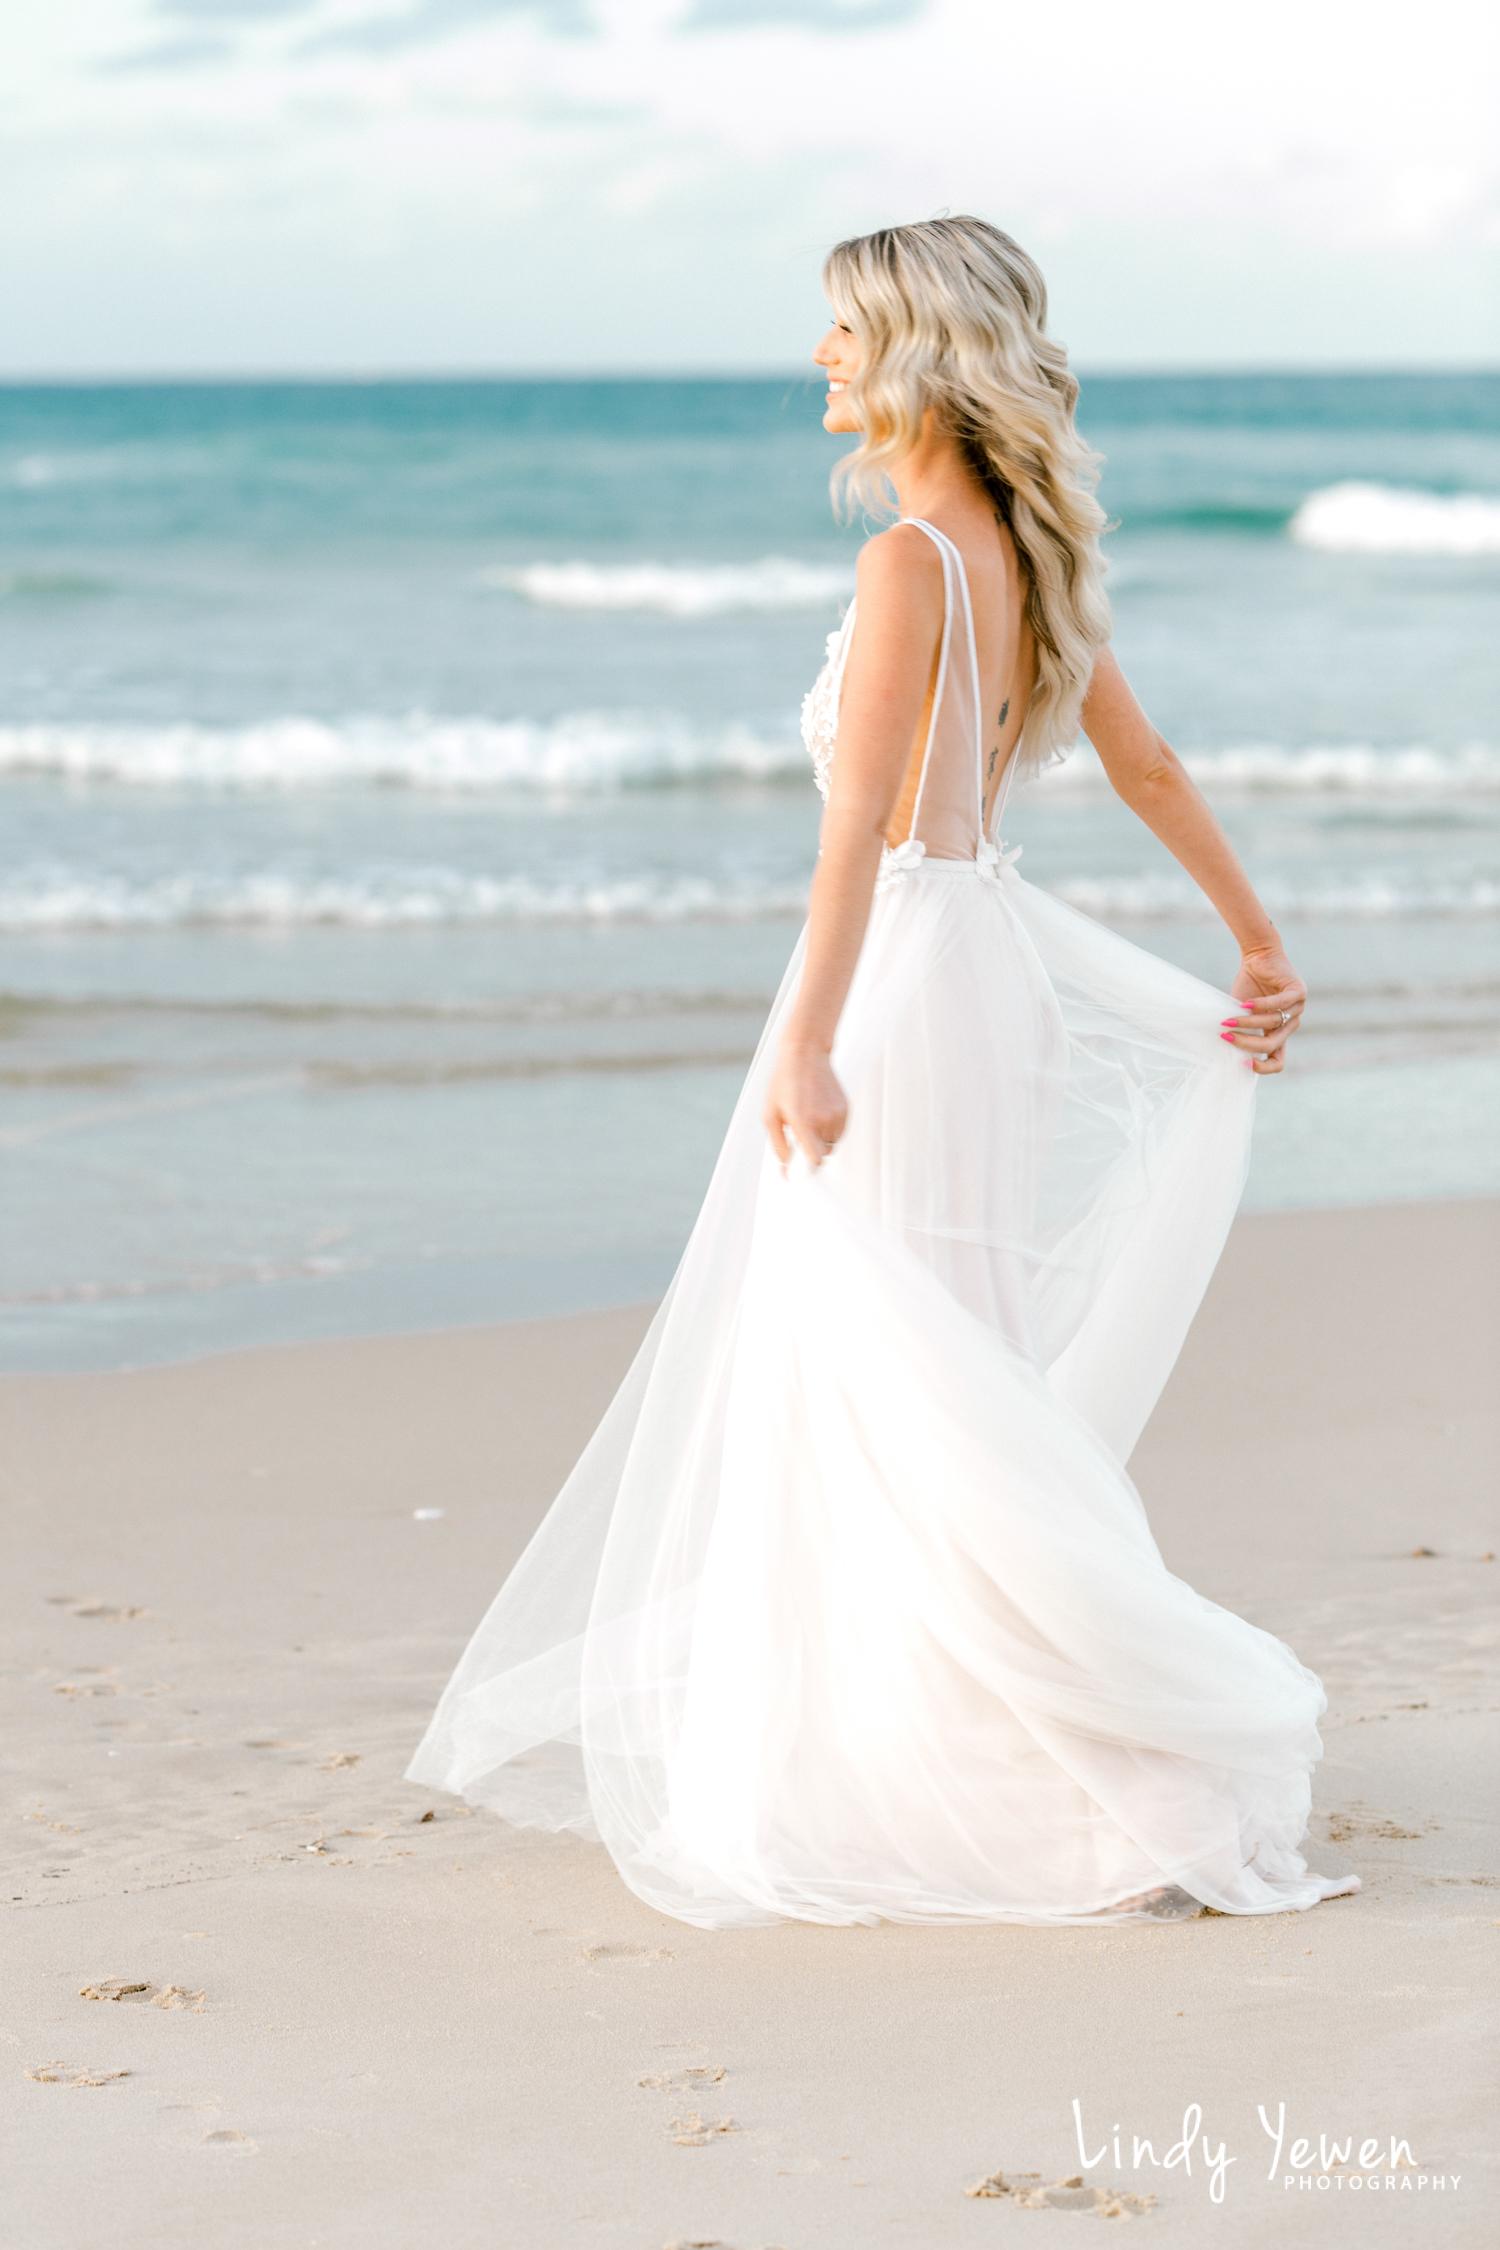 Lindy-Photography-Noosa-Weddings-Grace-Chris 105.jpg